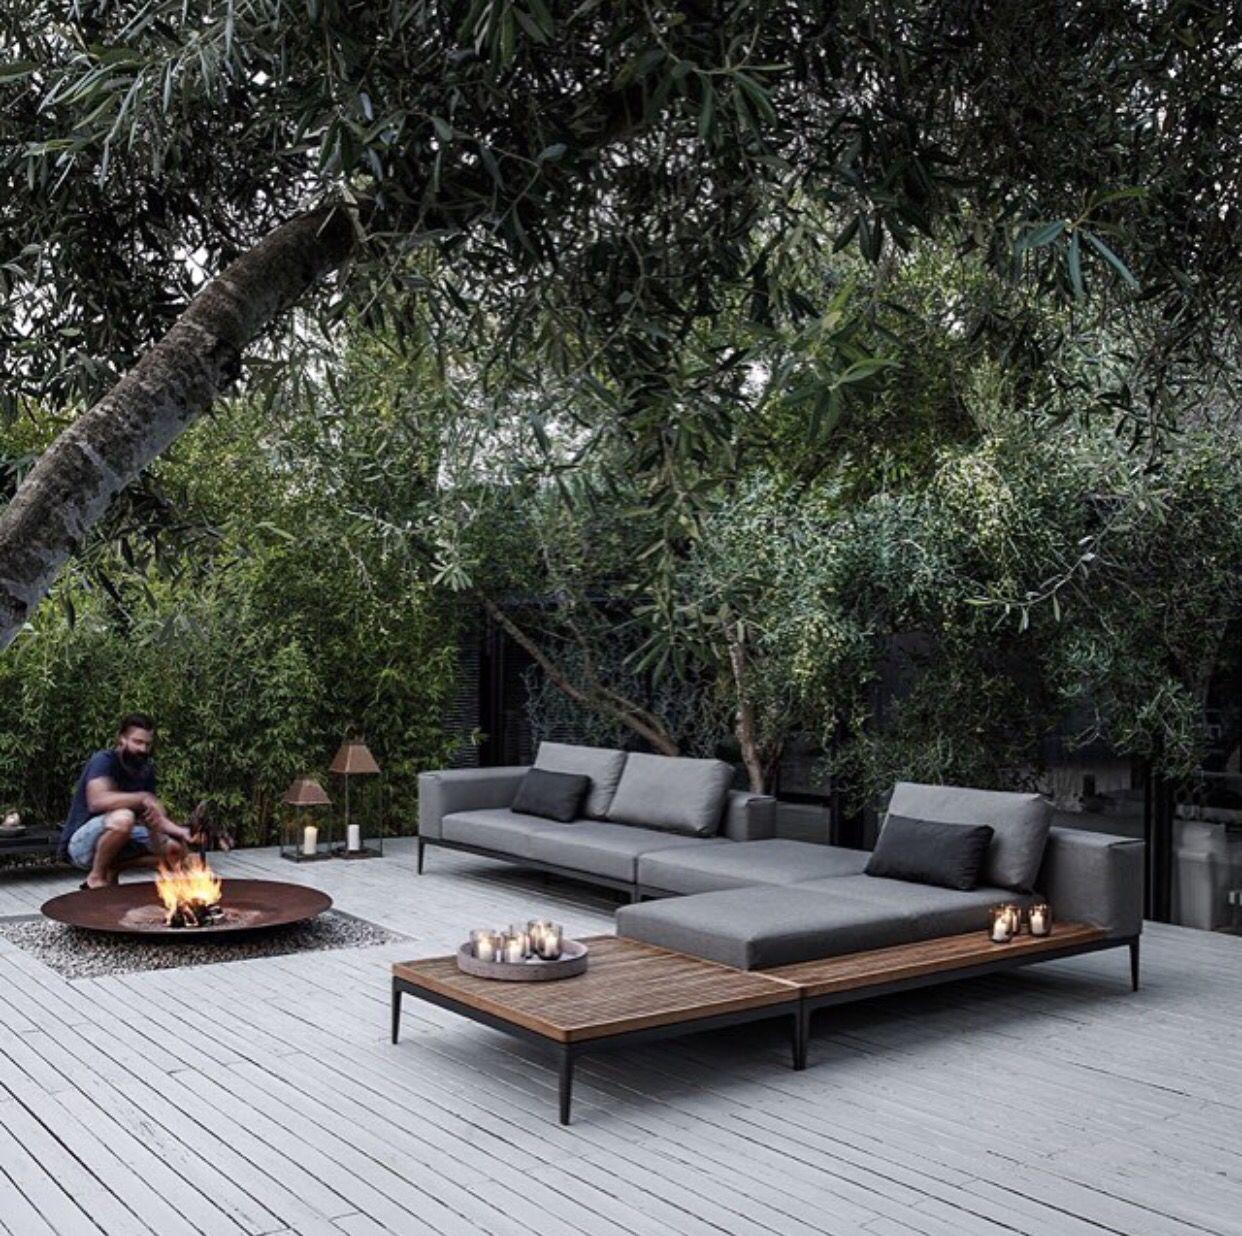 Outdoor | Mobilier Jardin, Mobilier De Jardin Contemporain ... destiné Mobiler De Jardin